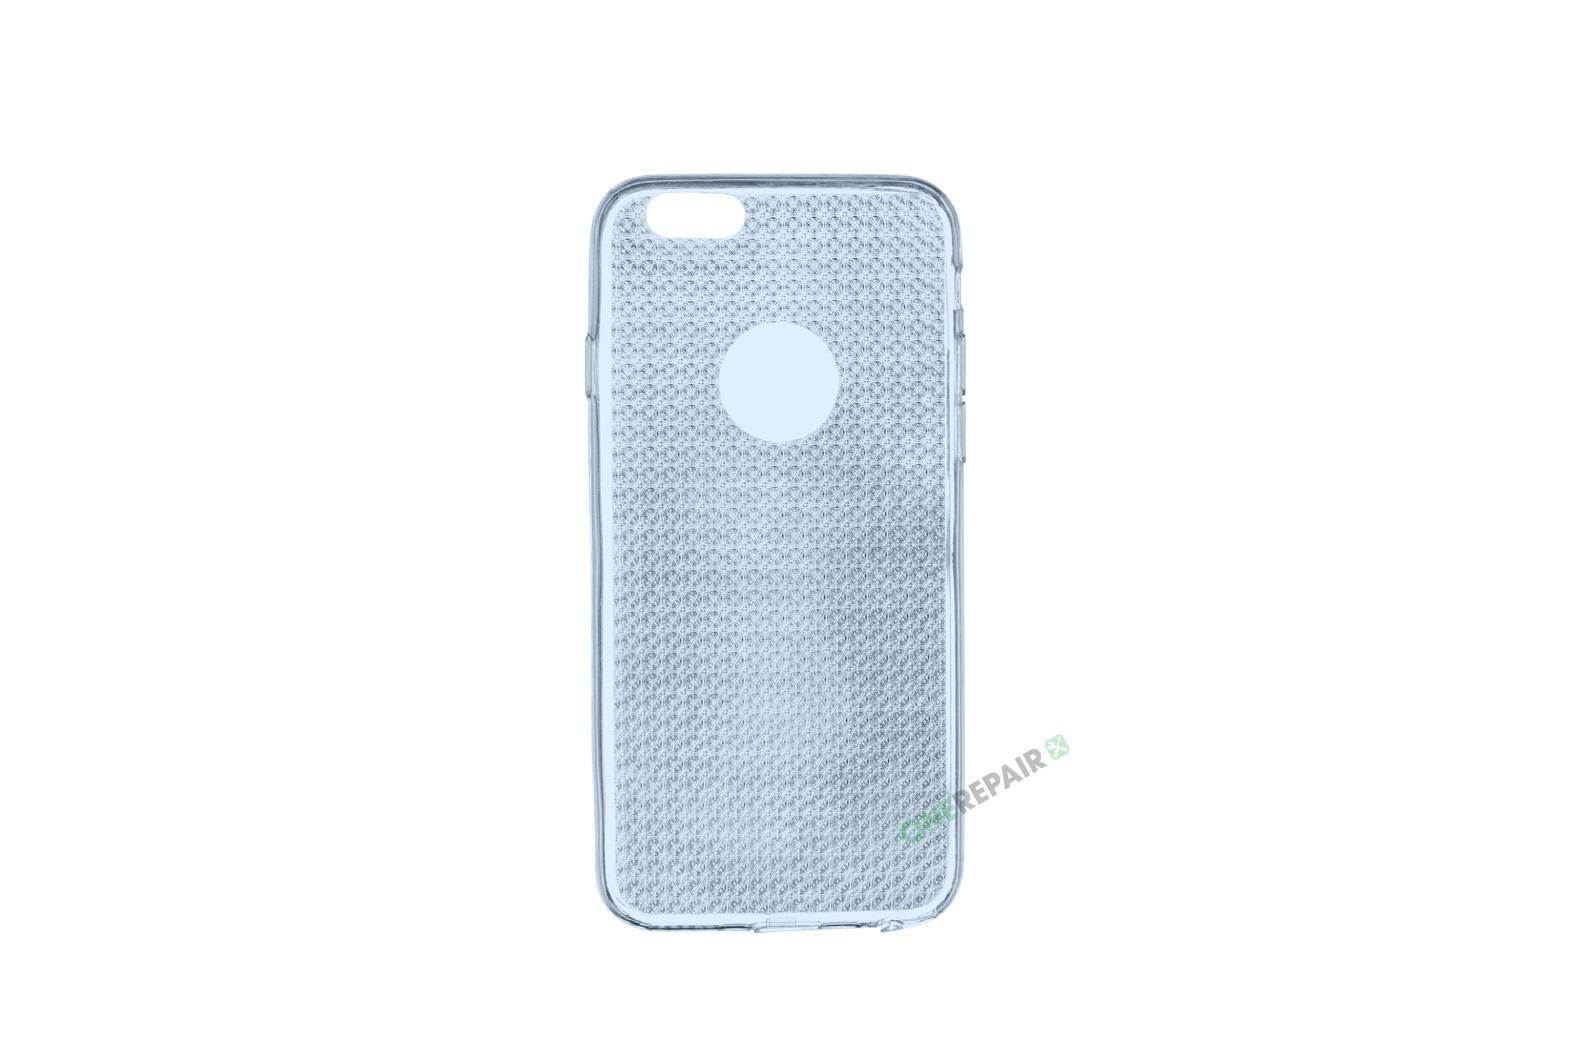 iPhone 6, 6S, A1549, A1586, A1589, A1633, A1688, A1700, A1691, Apple, Cover, Transparent, Gennemsigtig, Blaa, Blå